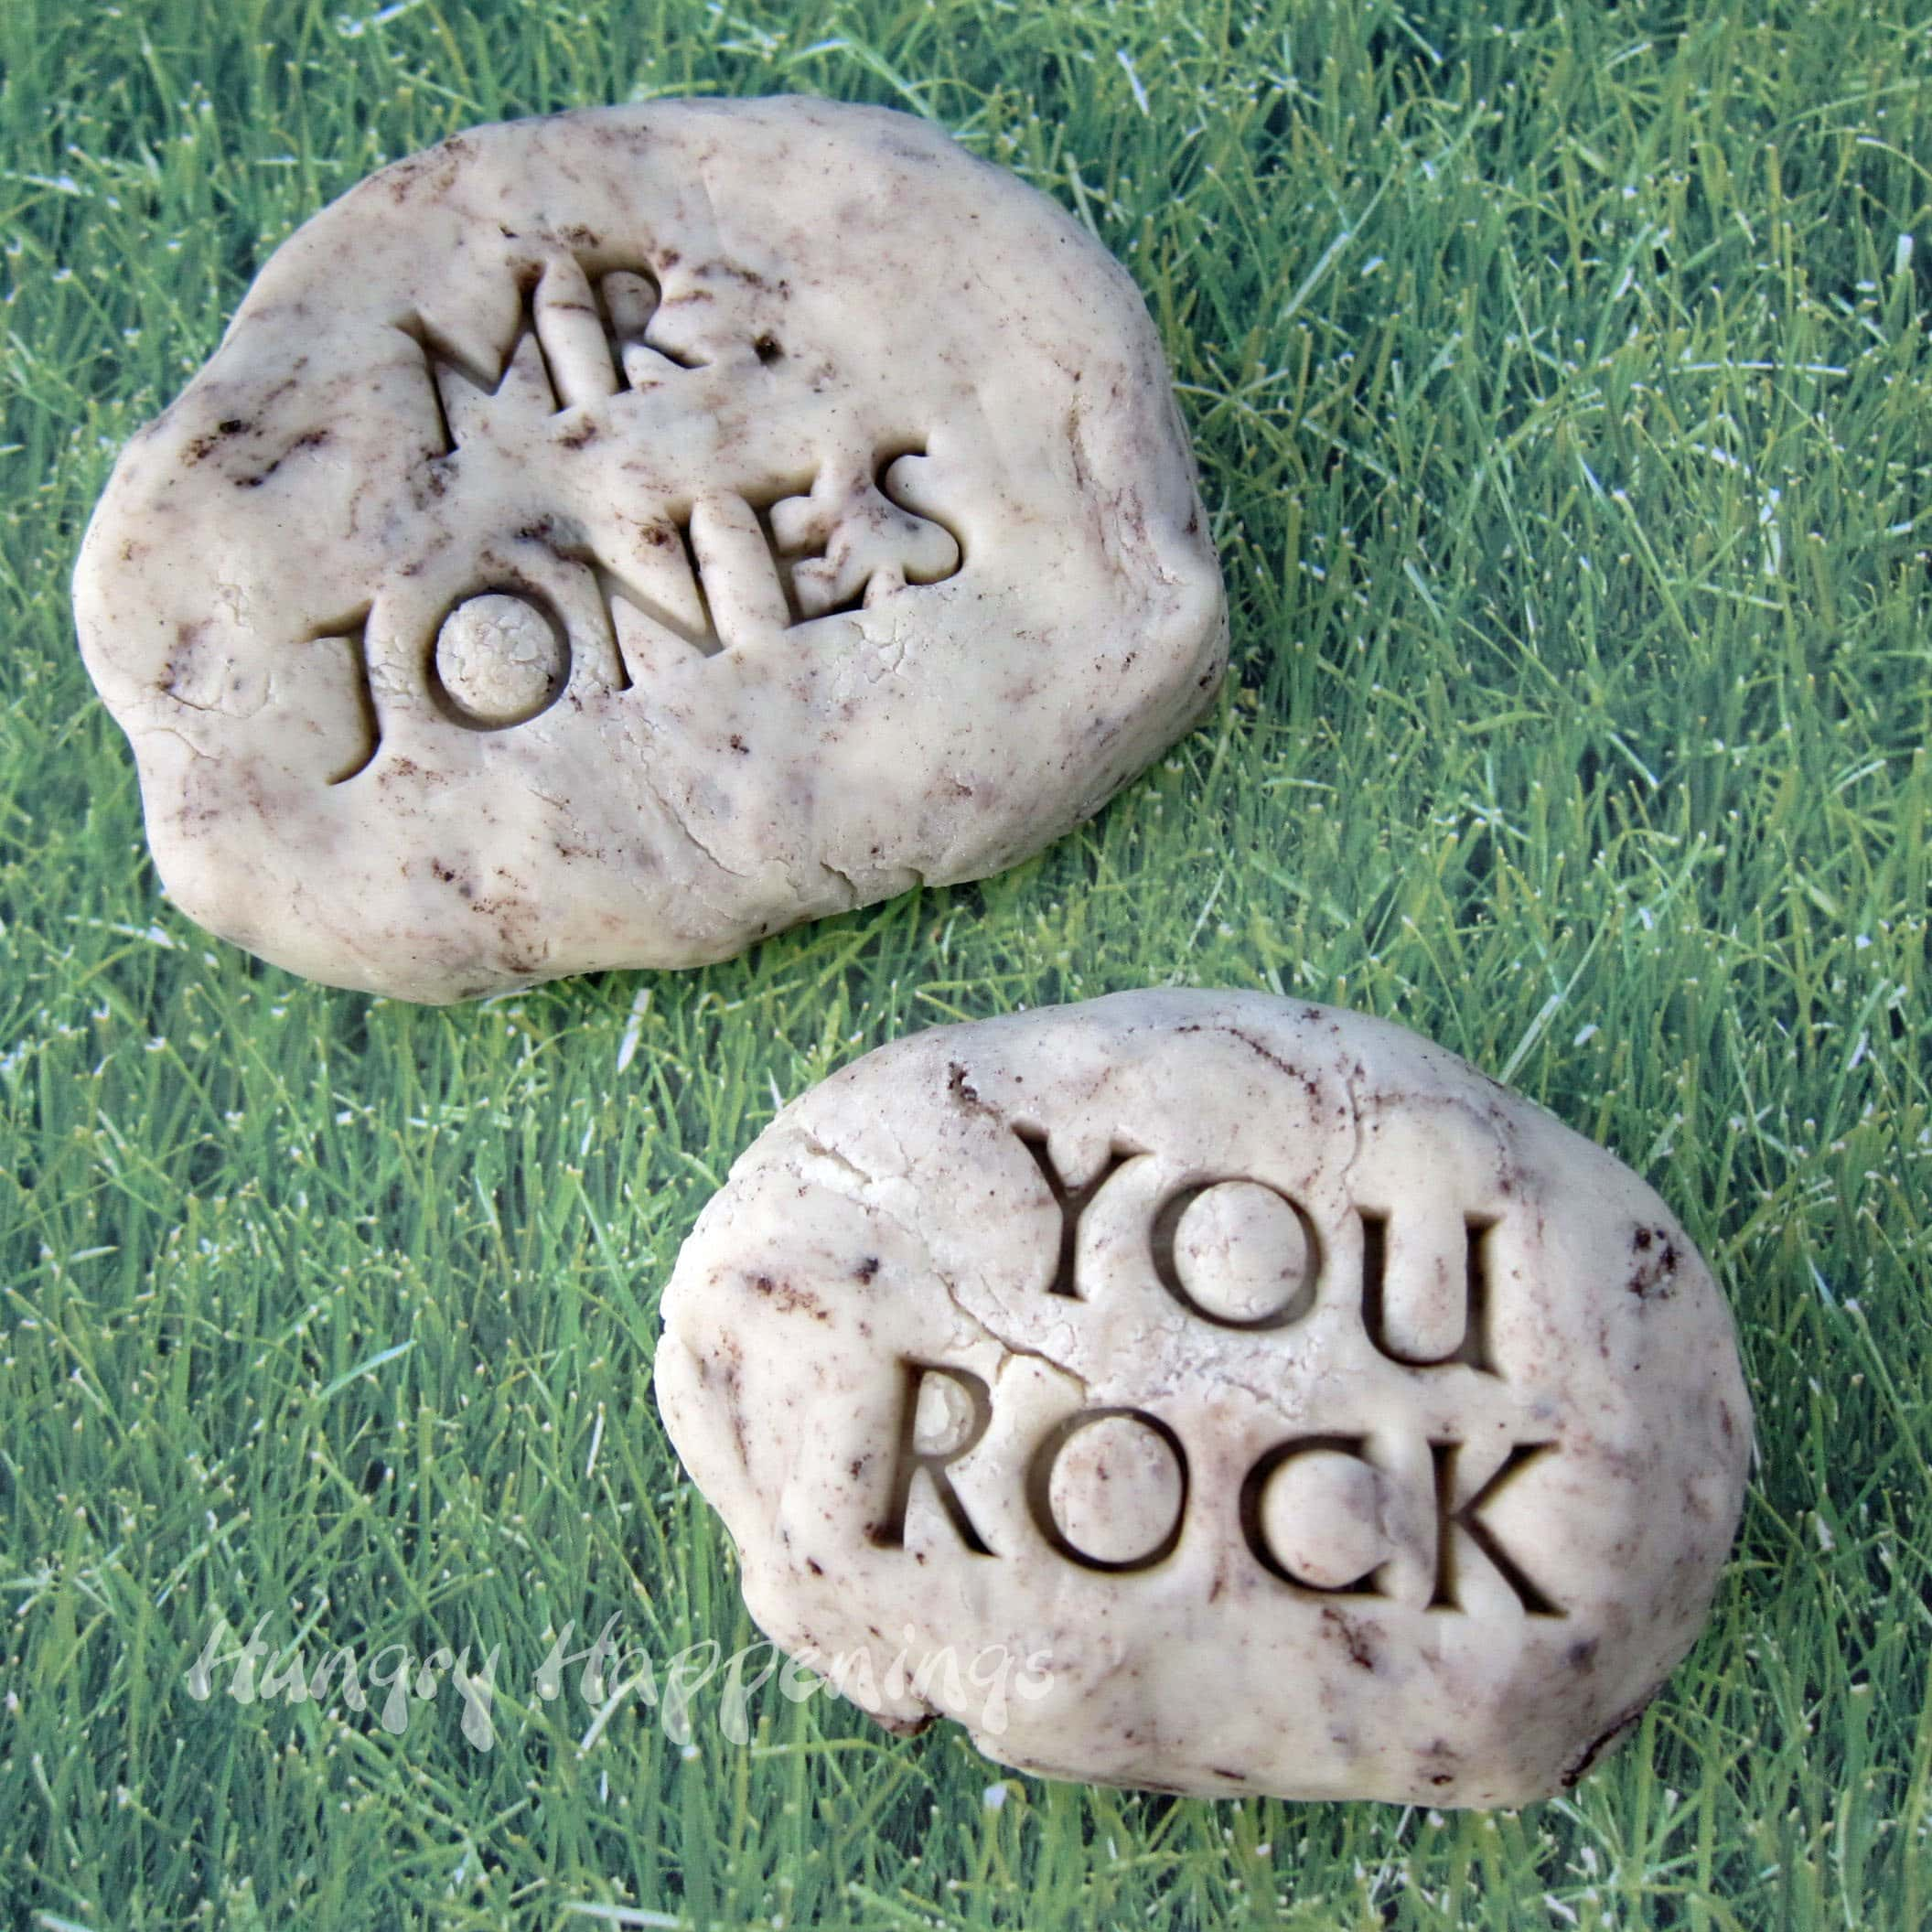 how to make edible rocks